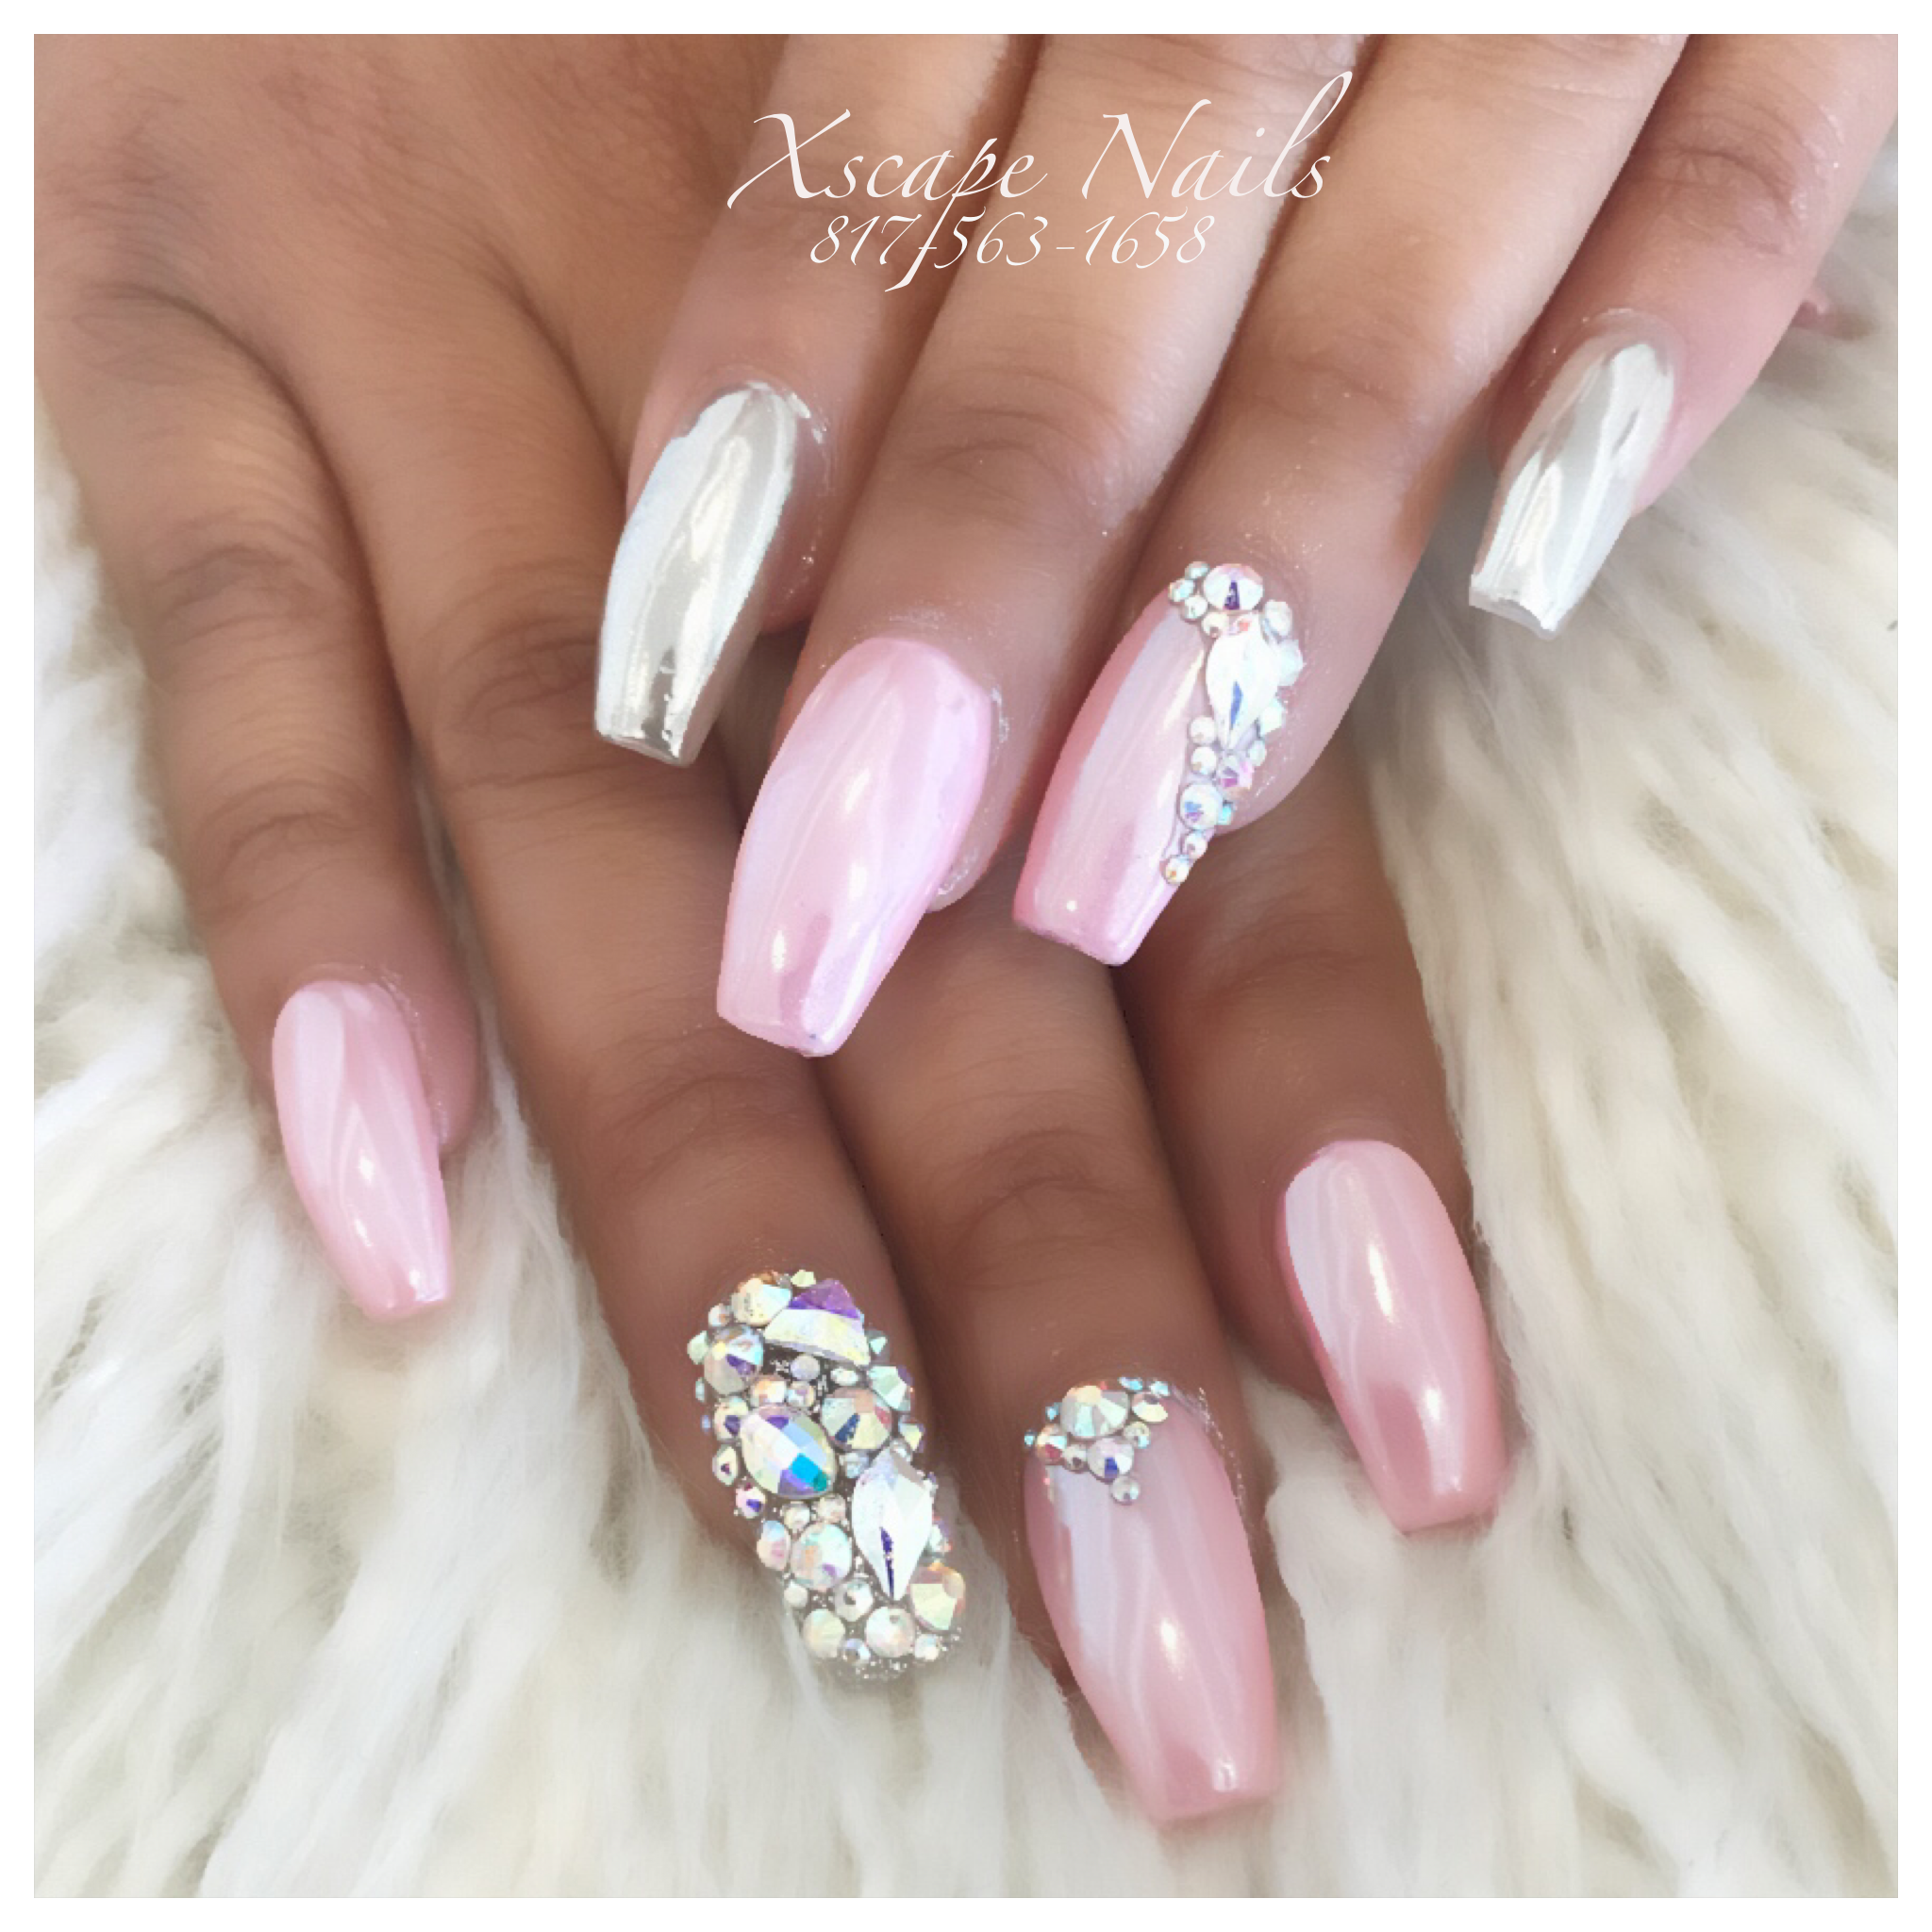 Pink chrome nails   Cute Nails Designs   Pinterest   Pink ...